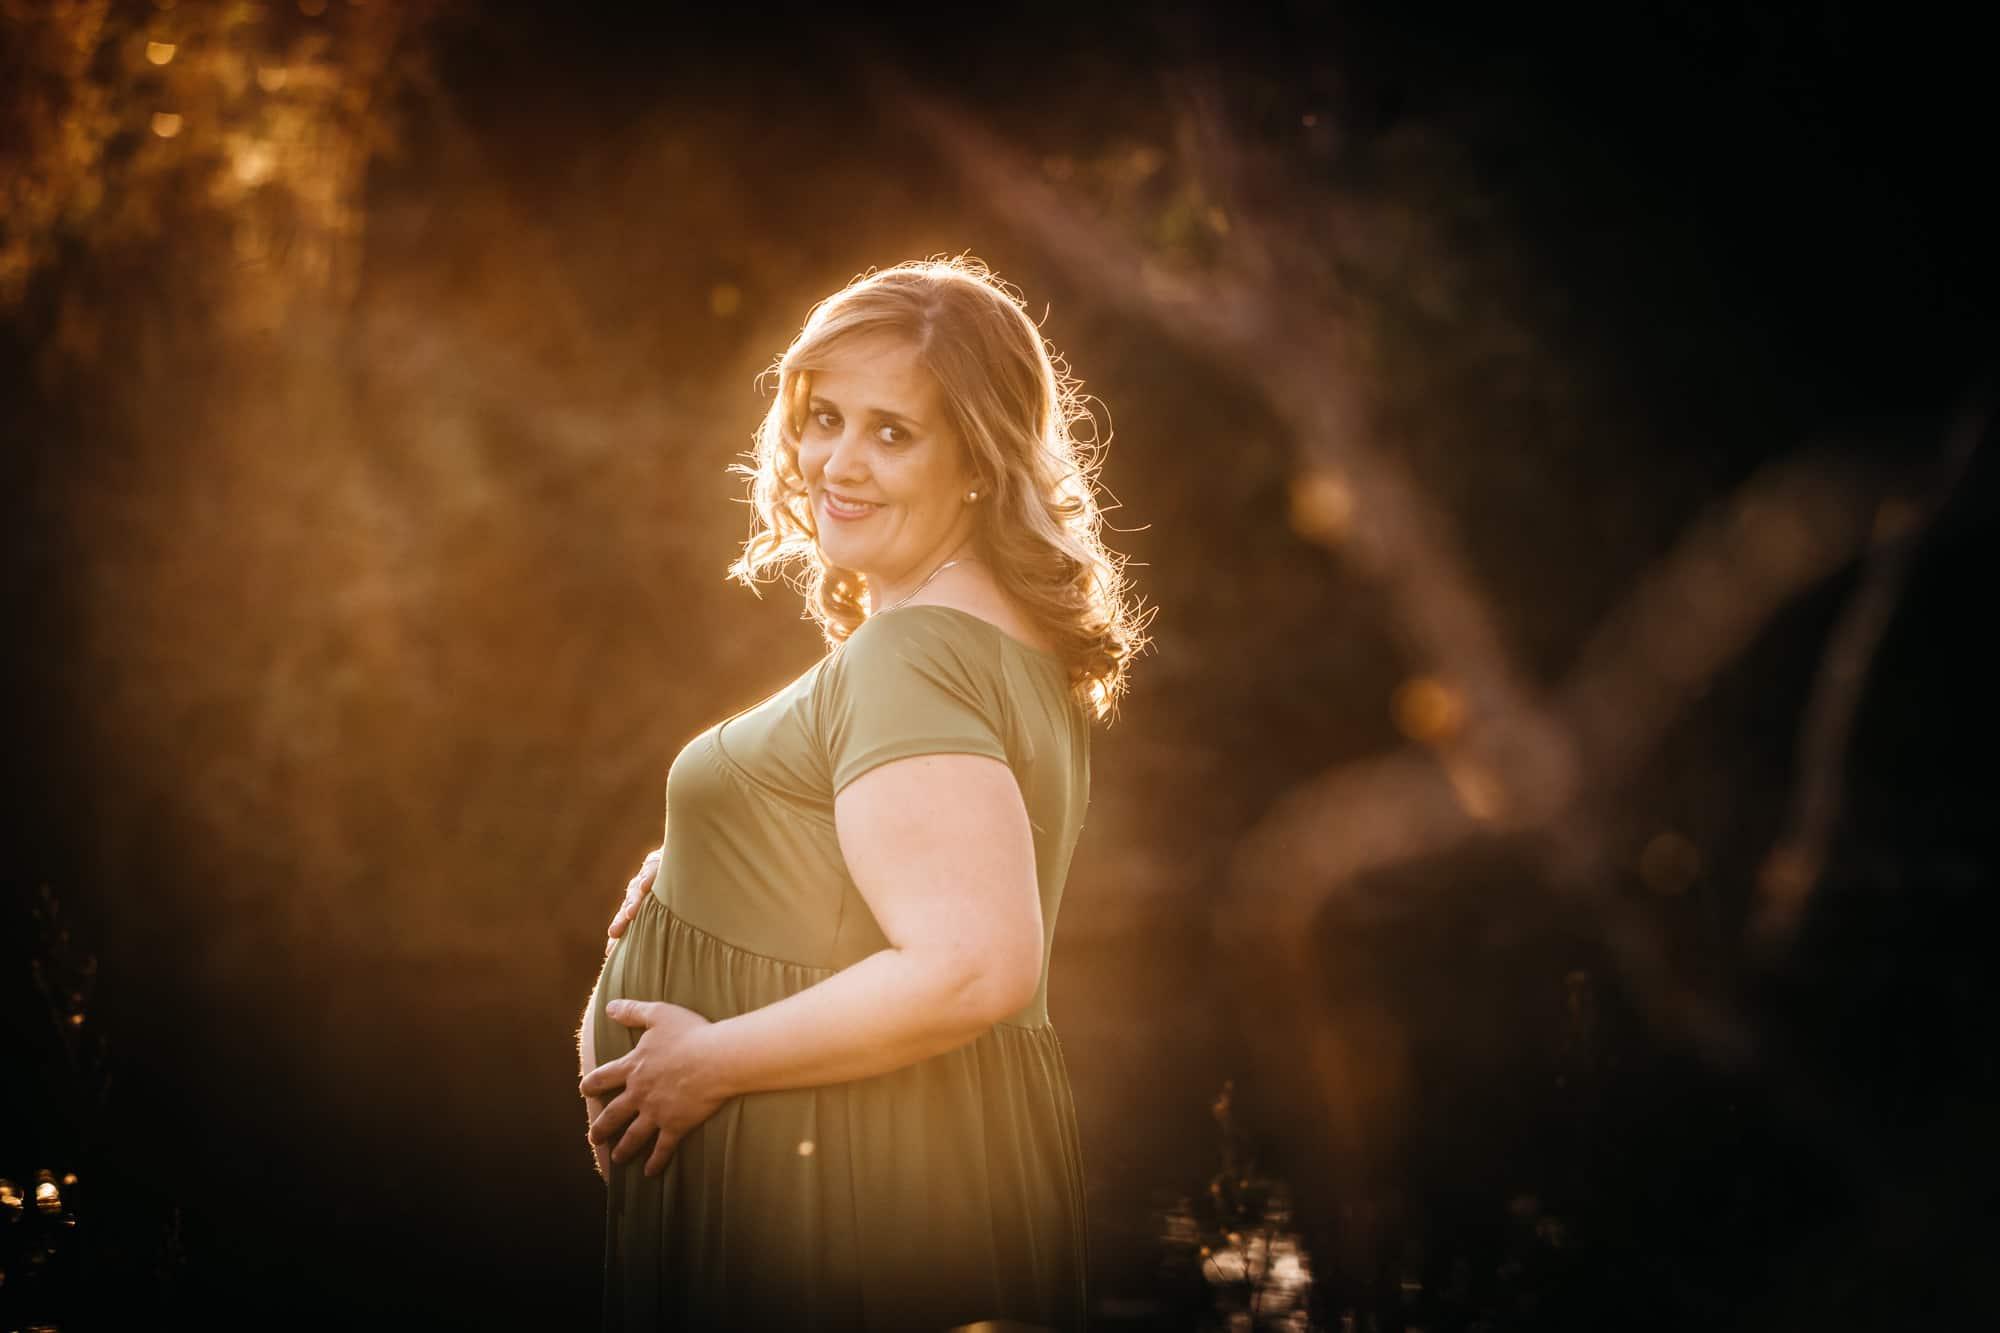 premama-embarazo-embarazada-nidoriestudio-fotos-valencia-almazora-castellon-españa-spain-05